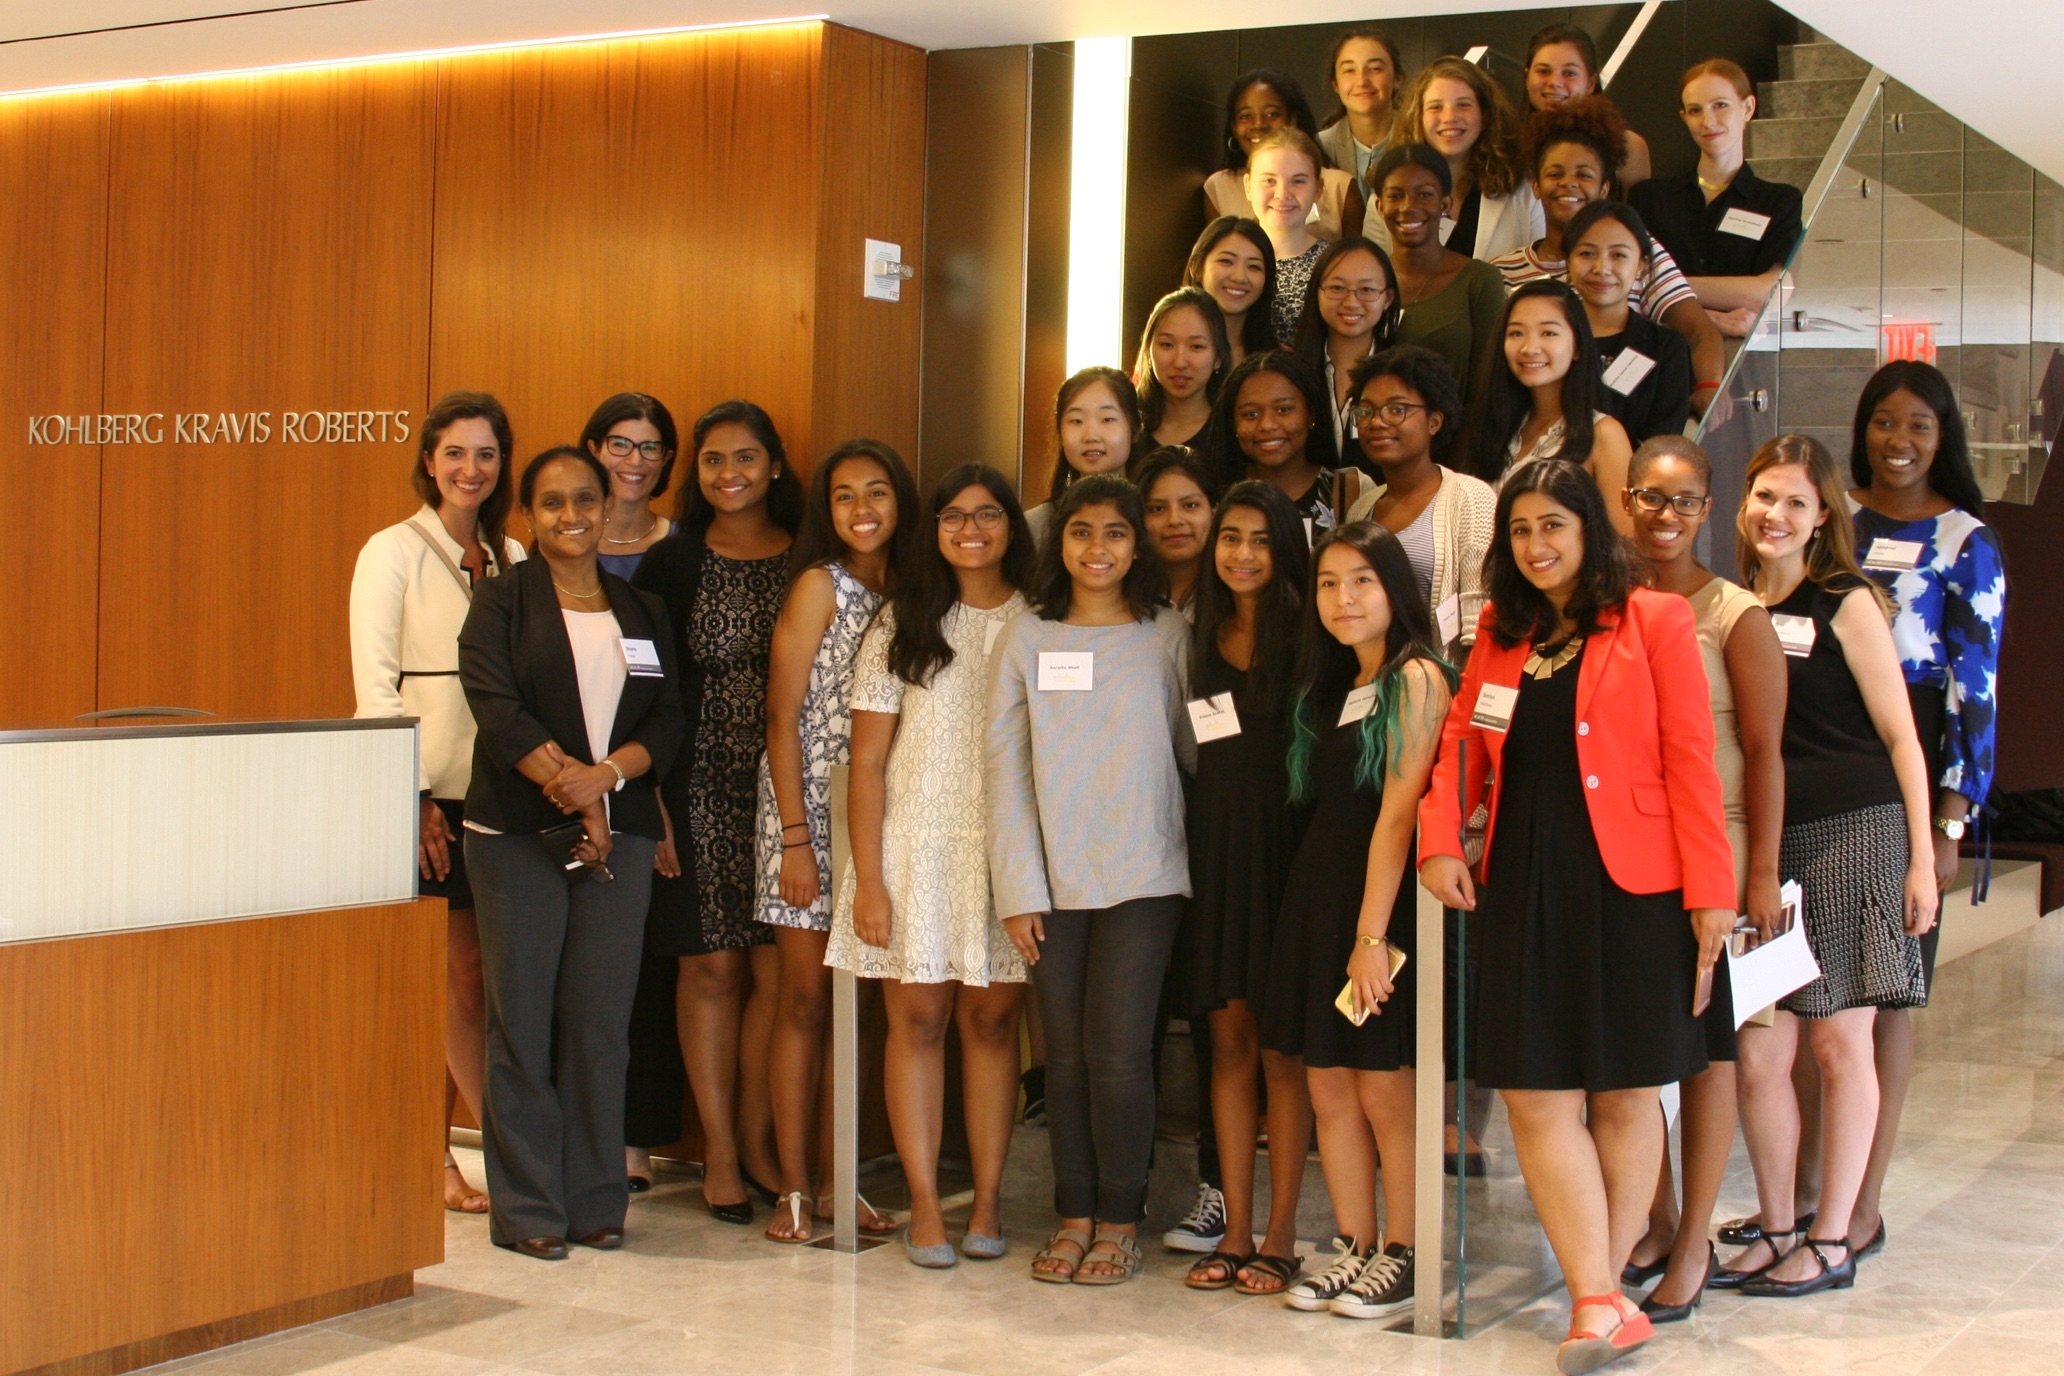 KKR Blog: Re-Defining #WomenInTech with Girls Who Code